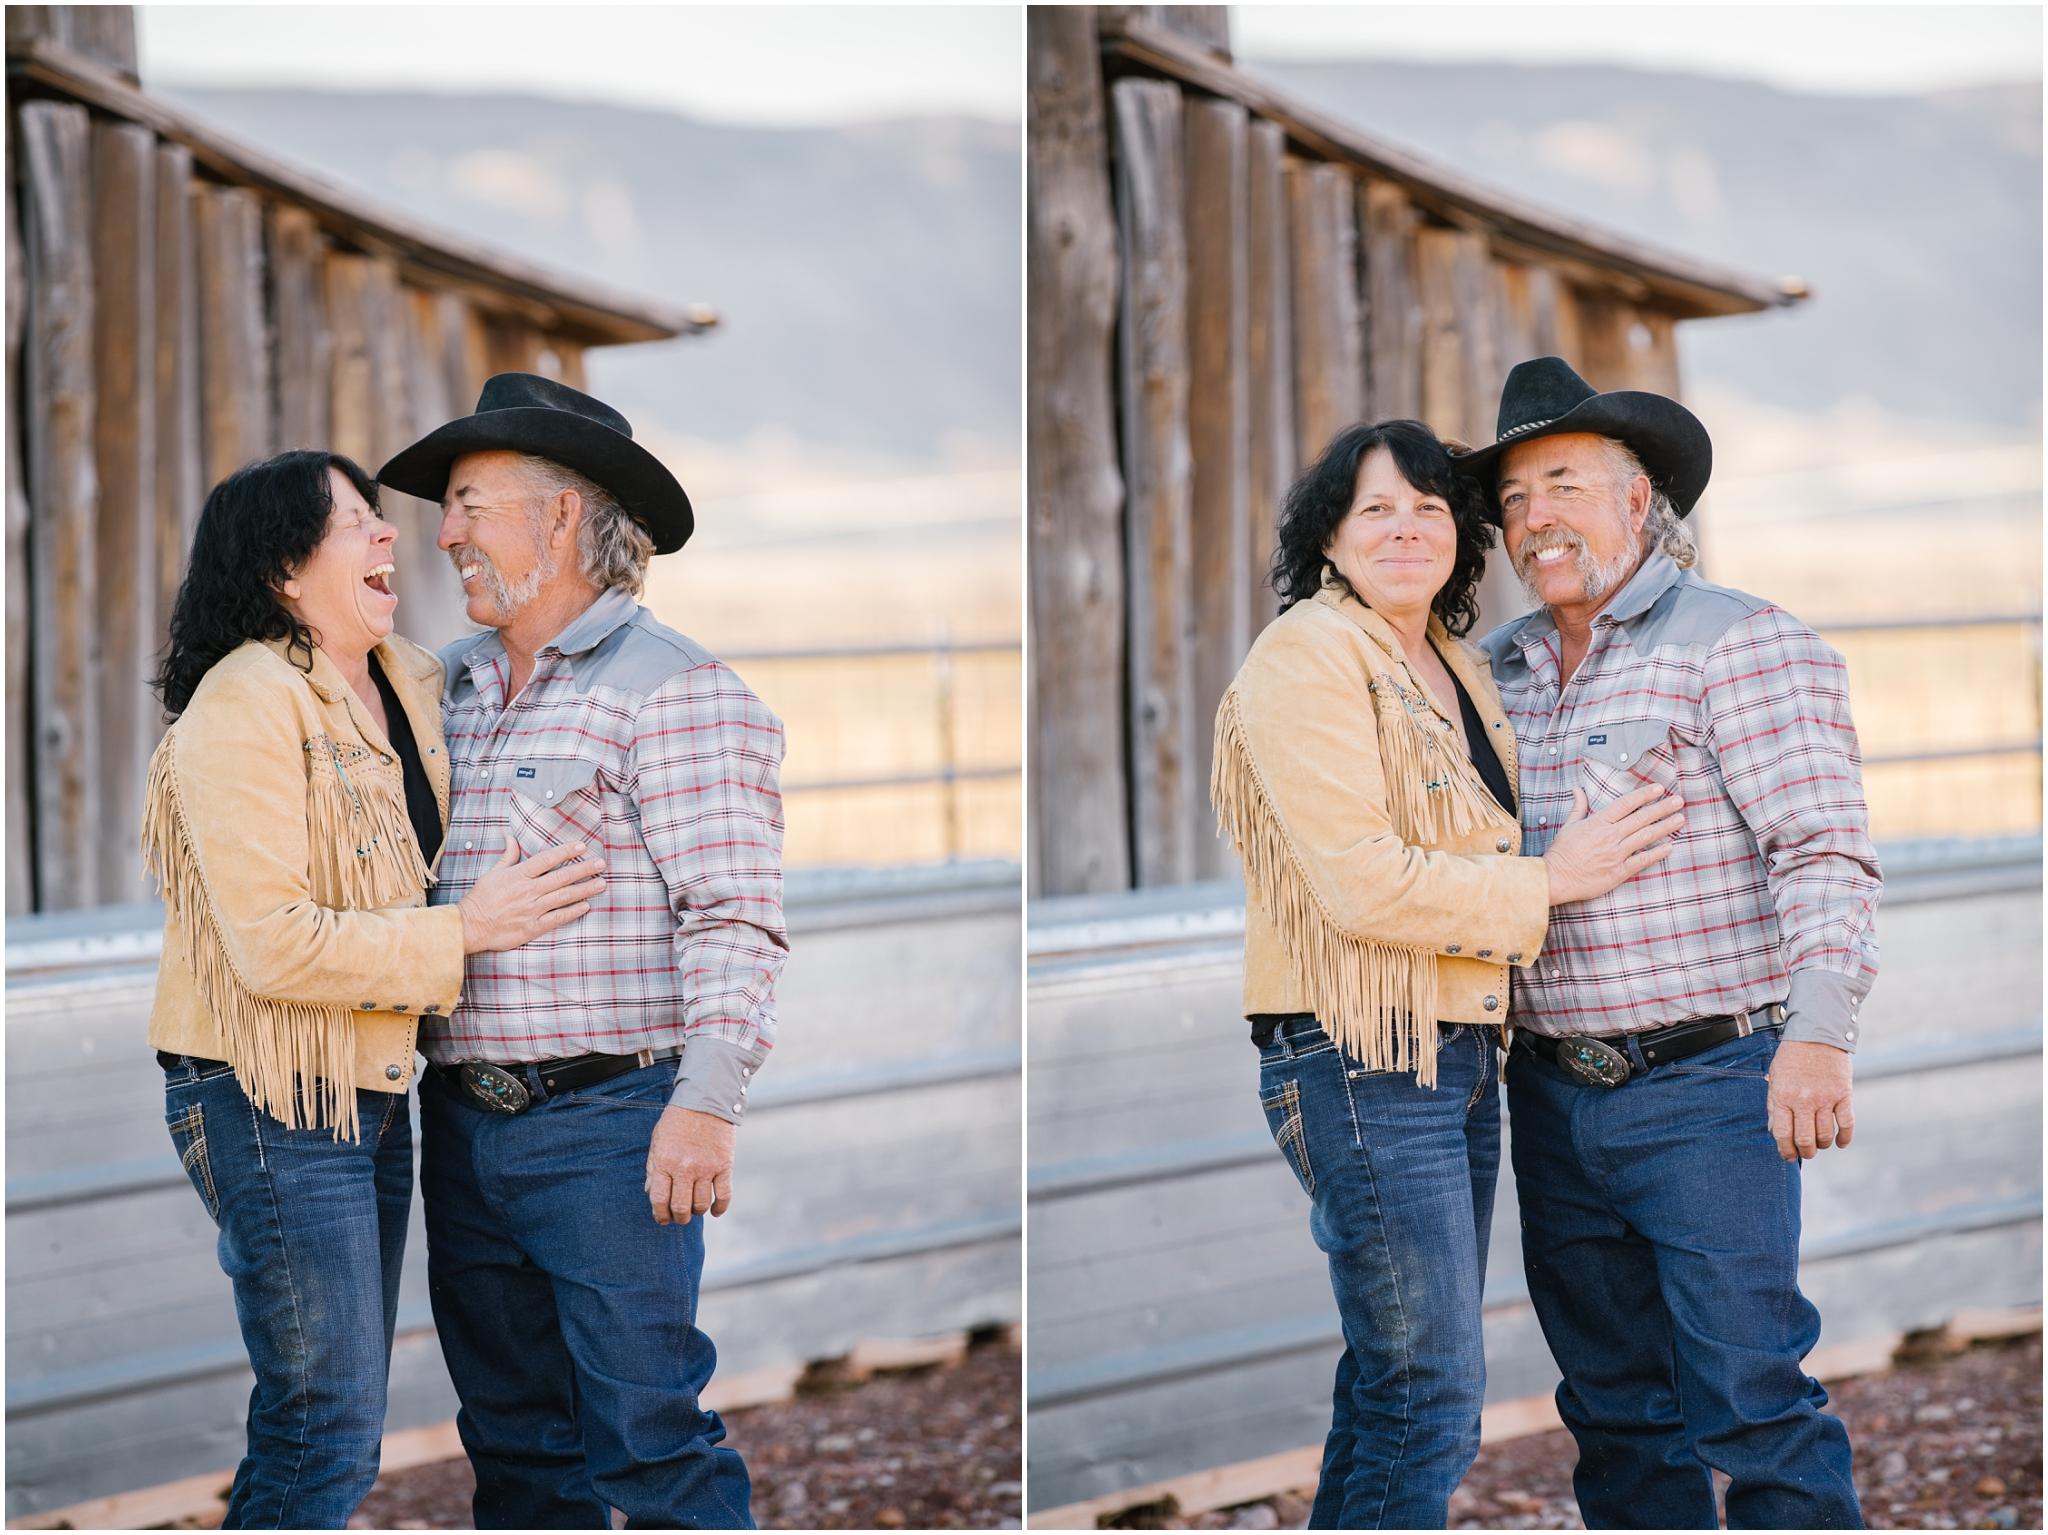 Conrad-93_Lizzie-B-Imagery-Utah-Family-Photographer-Utah-County-Central-Utah-Park-City-Extended-Family-Session.jpg